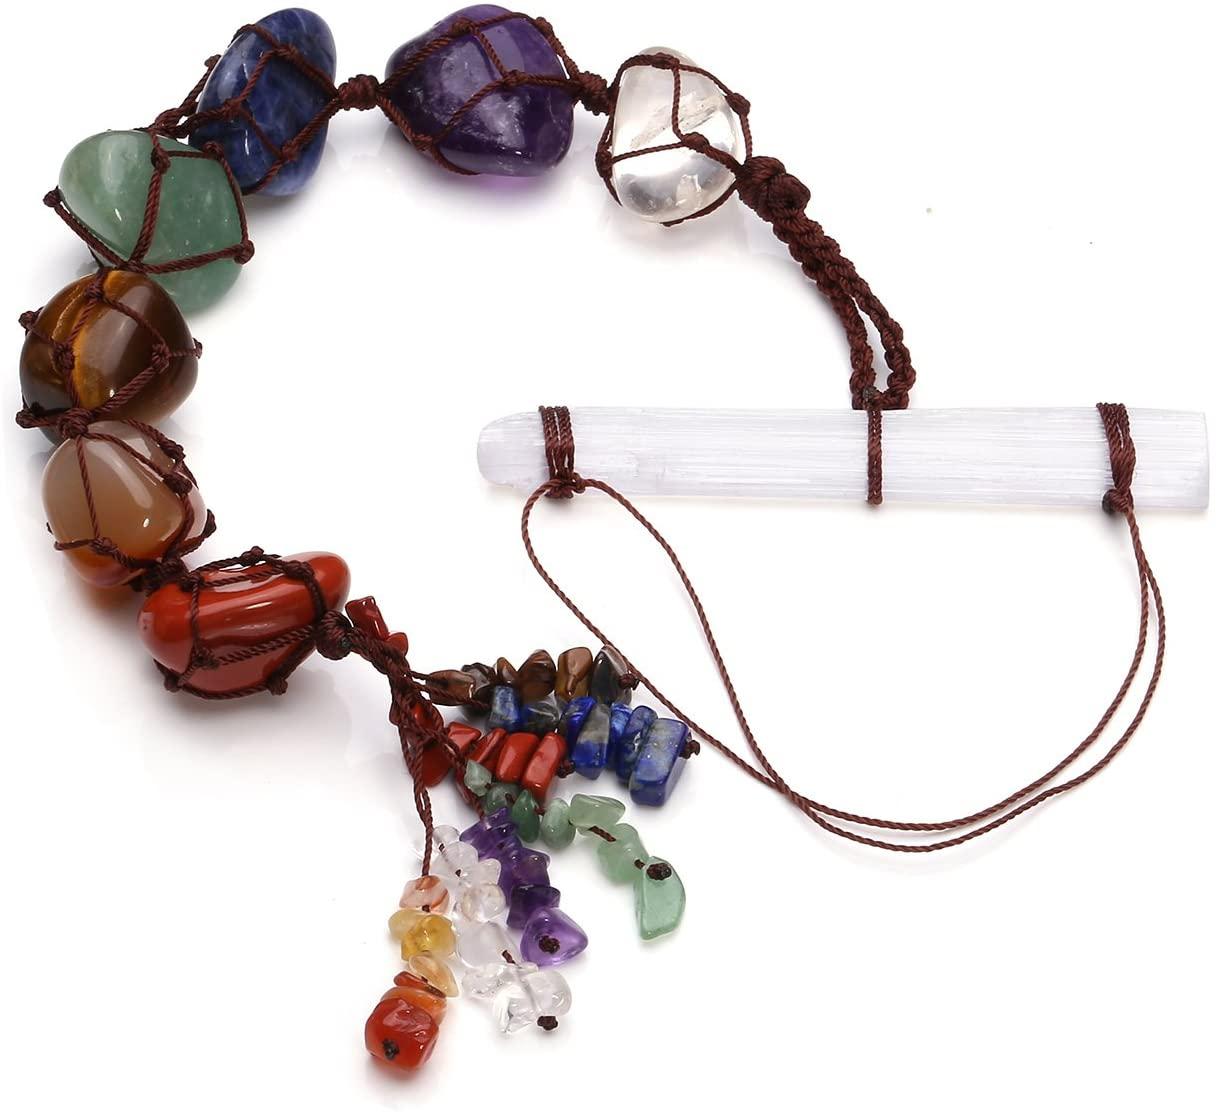 Jovivi Chakra Ornament Set - Selenite Crystal + 7 Chakra Tumbled & Chipped Gemstones Tassel Spiritual Meditation Hanging Ornament/Window Ornament/Feng Shui Witch Yoga Decor